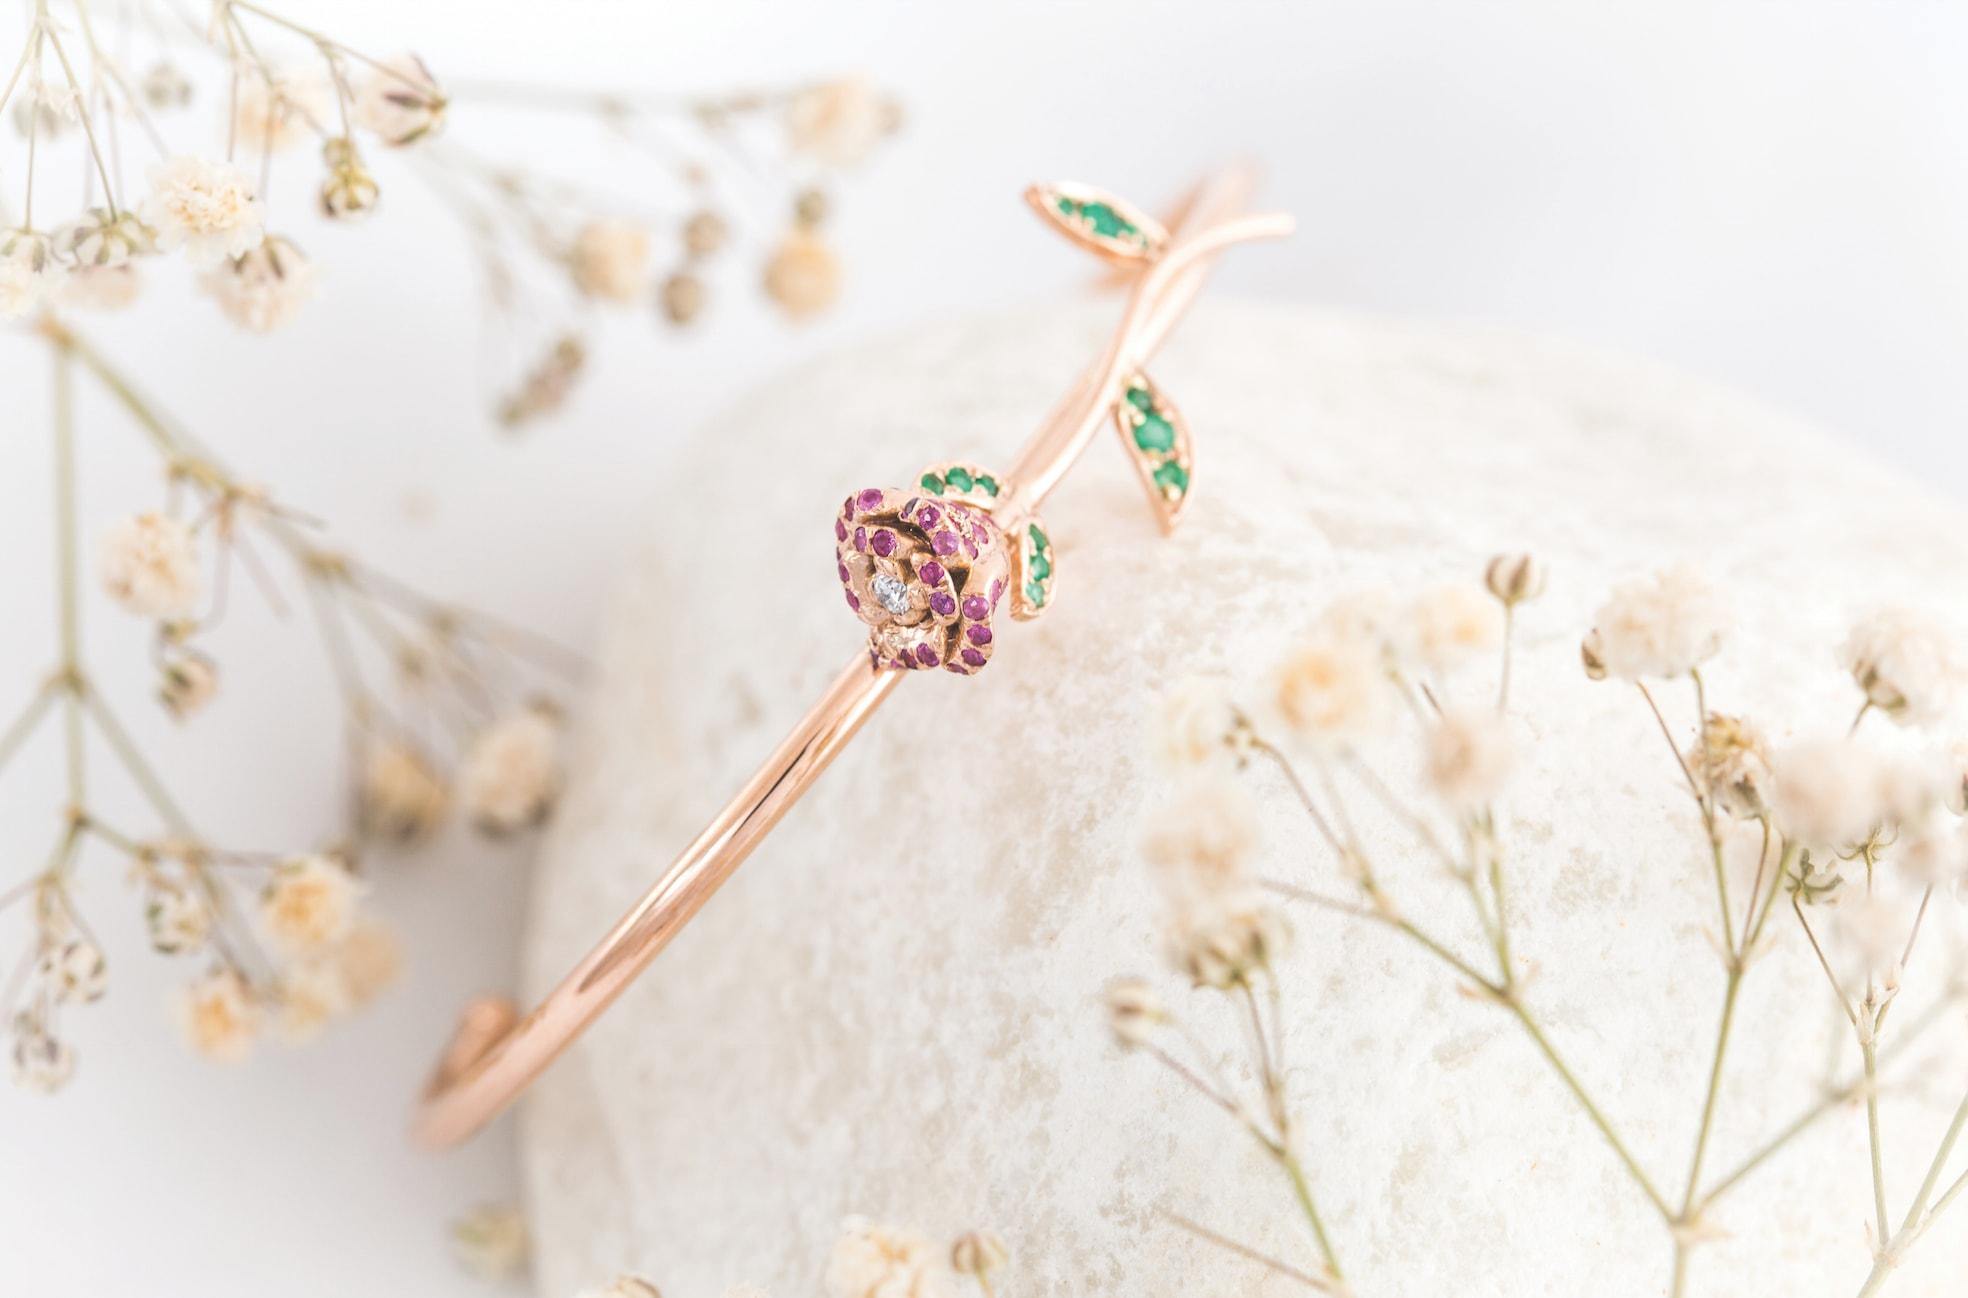 EVERYDAY-LUXURY-Shurooq-Al-Midfa-rose-bracelet